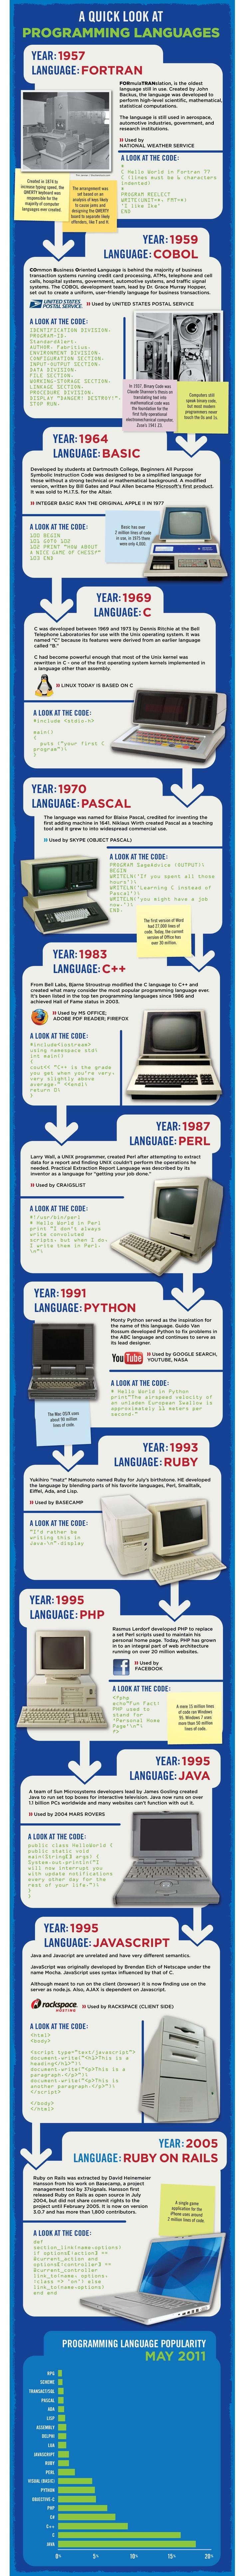 Programming Language History